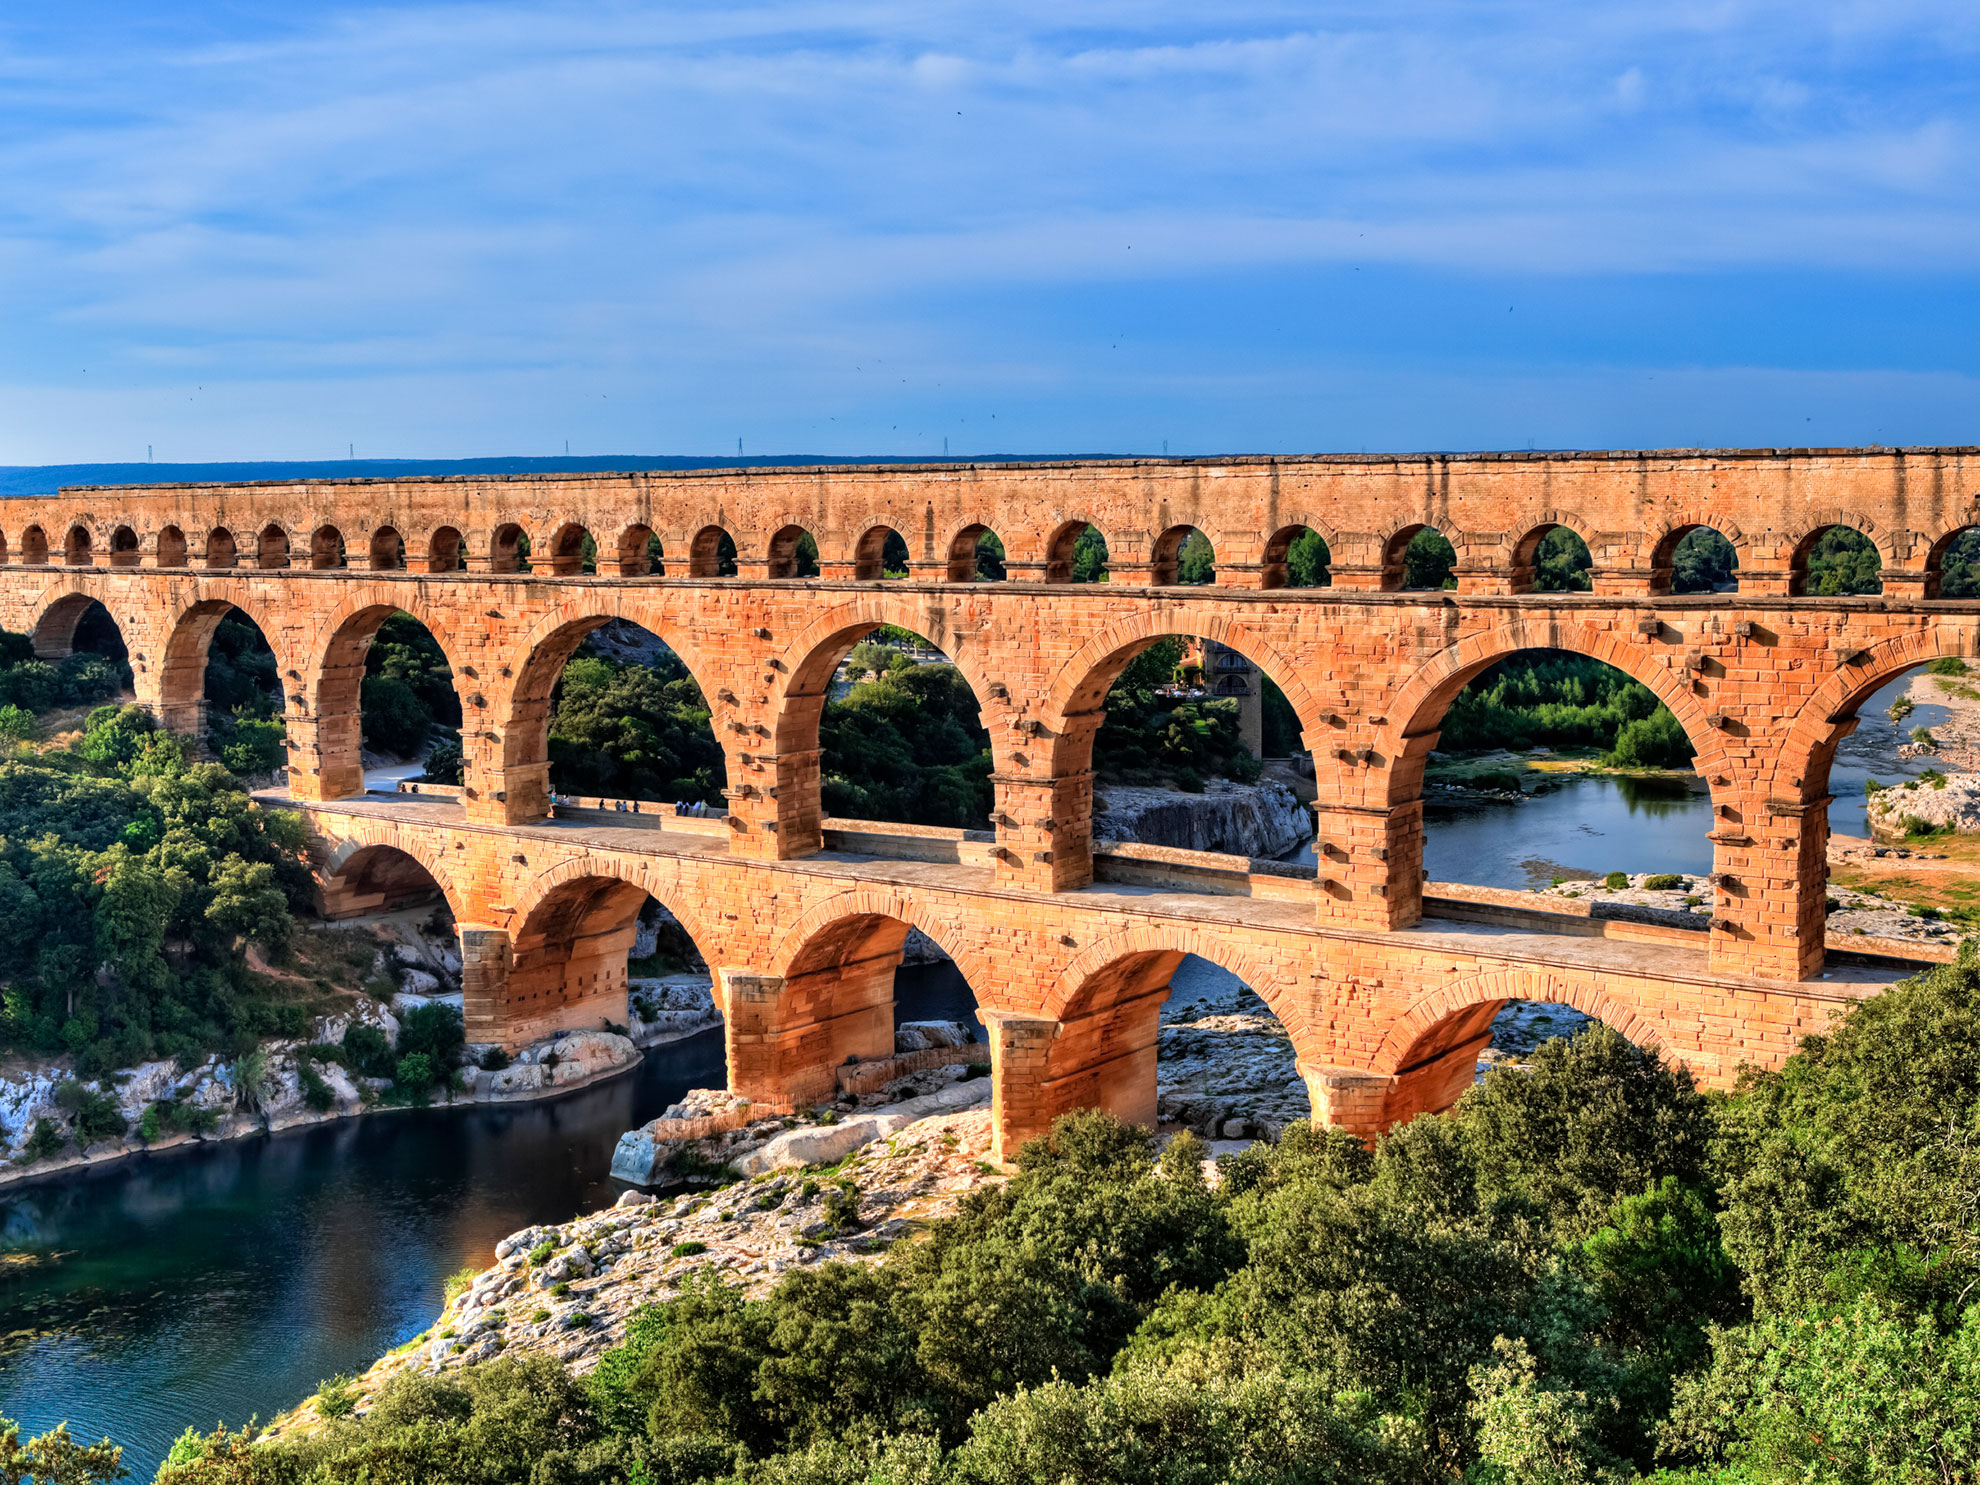 gard du pont france bridges nimes roman worldstrides aqueduct bridge quiz iconic architecture these bce near around history midterm population